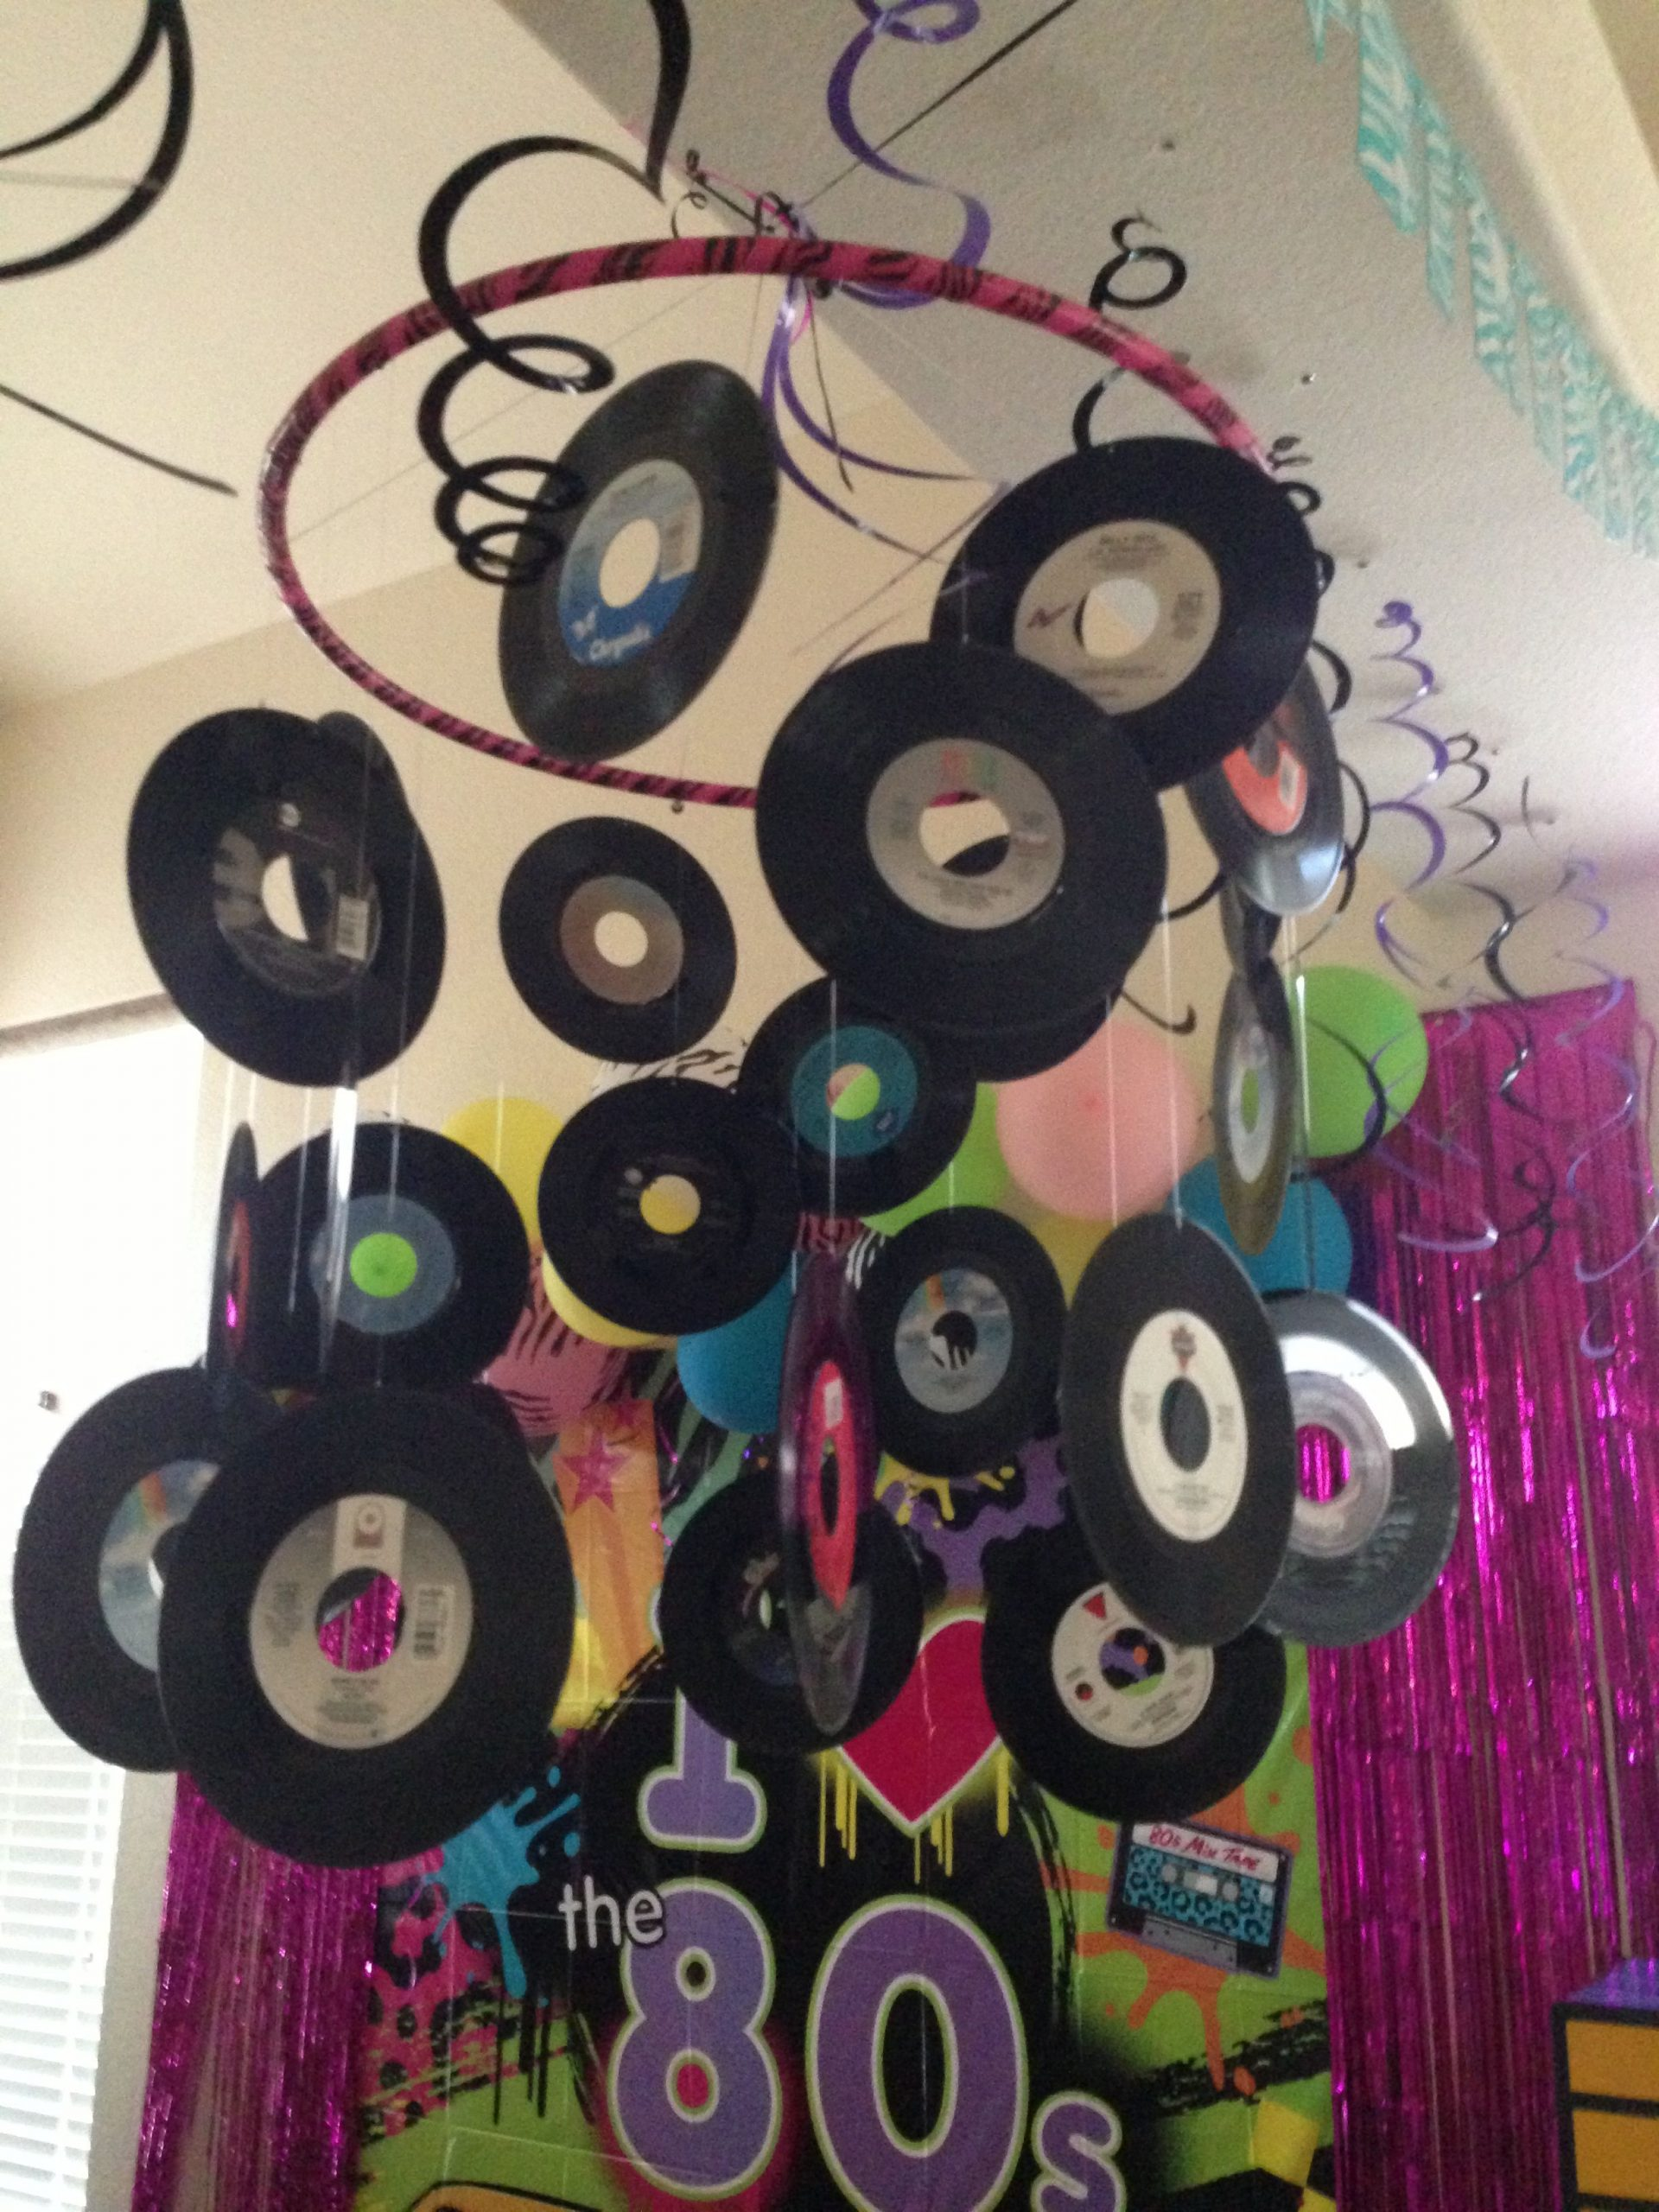 80s Party Decorations DIY